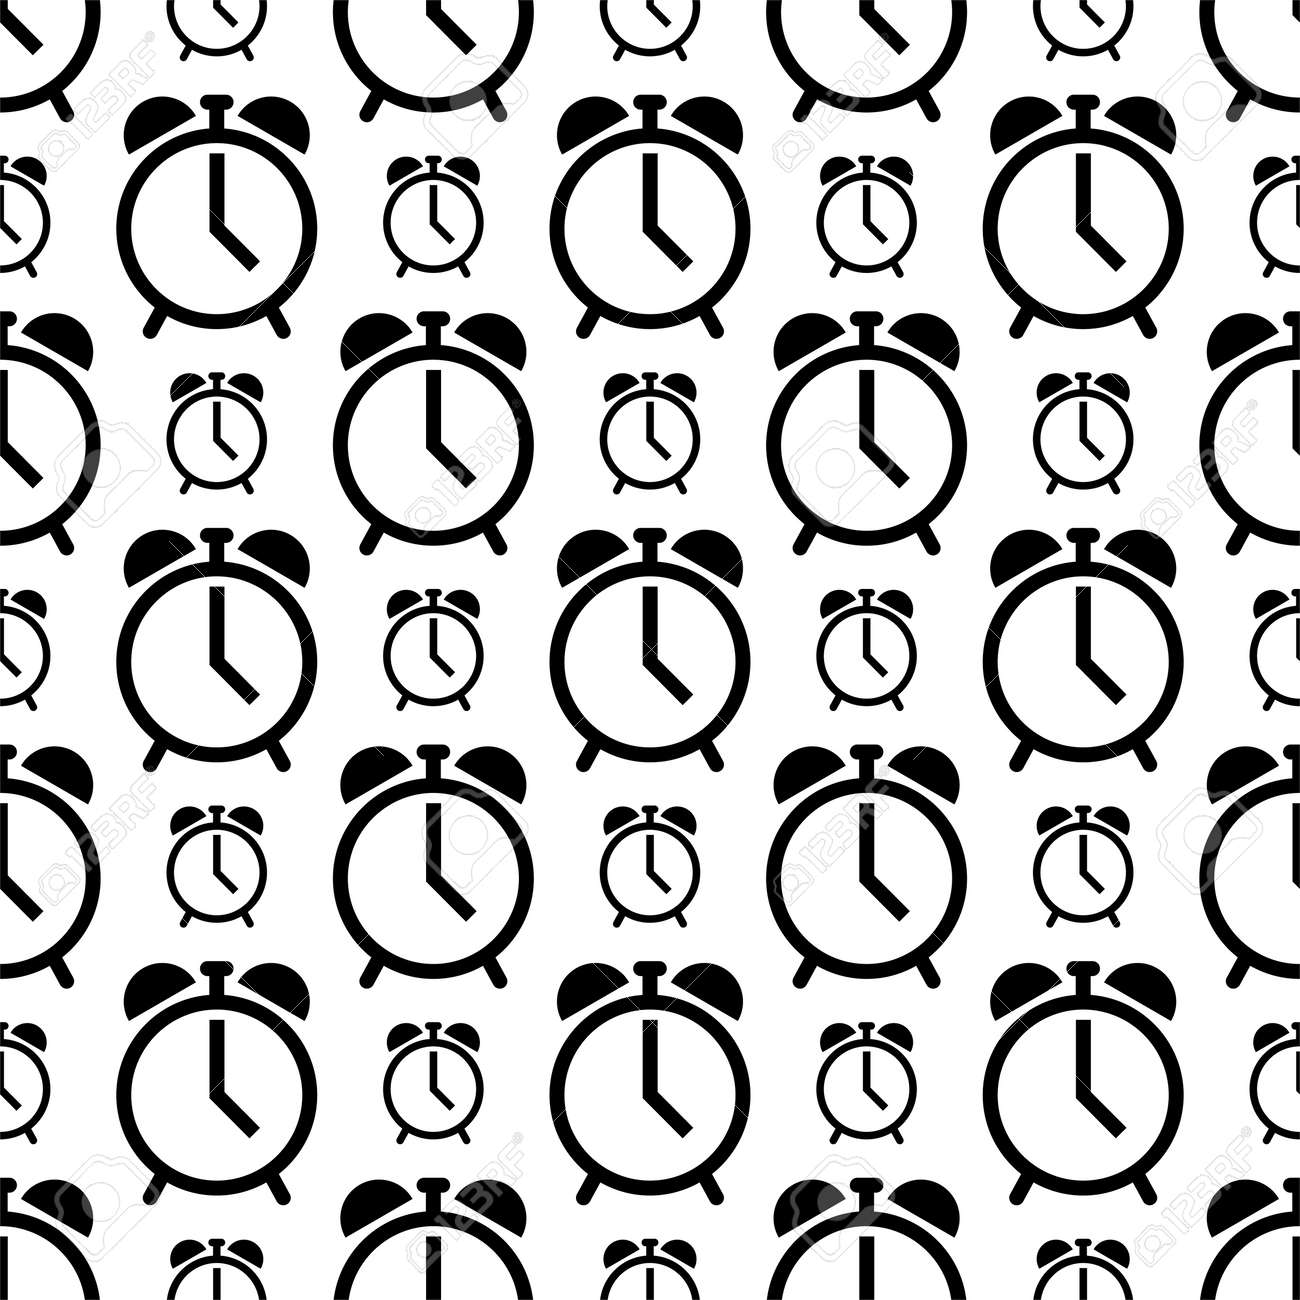 Alarm Clock Icon Seamless Pattern Vector Art Illustration - 149570943